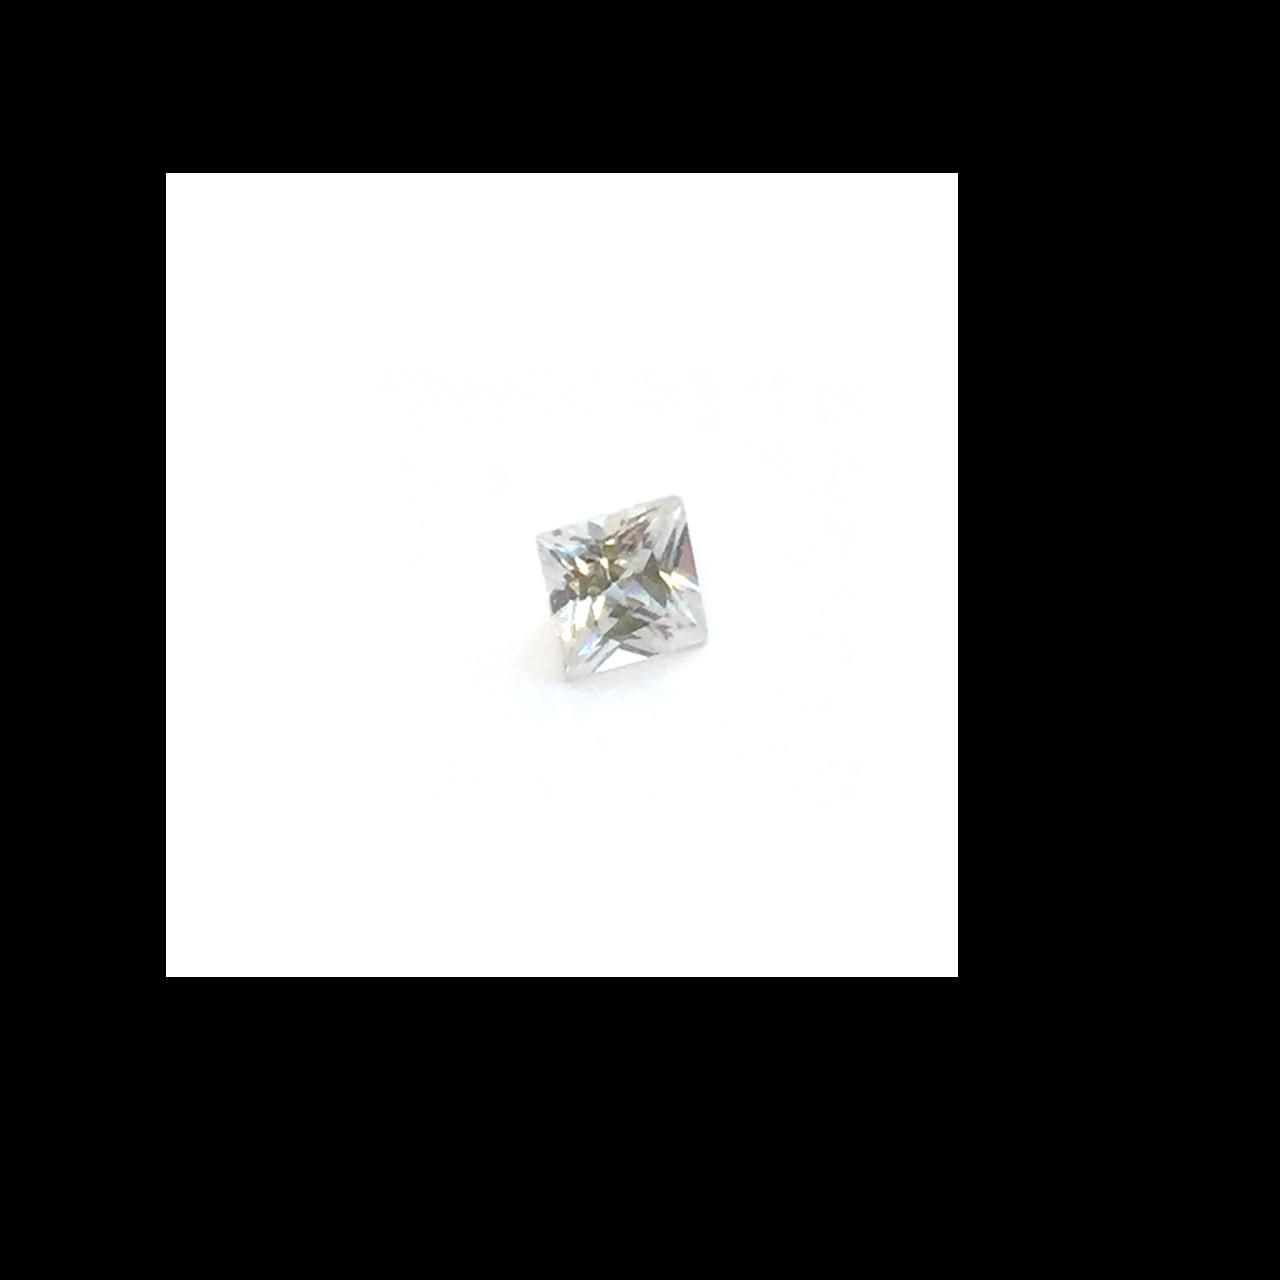 Lab Created Gemstone - White Square